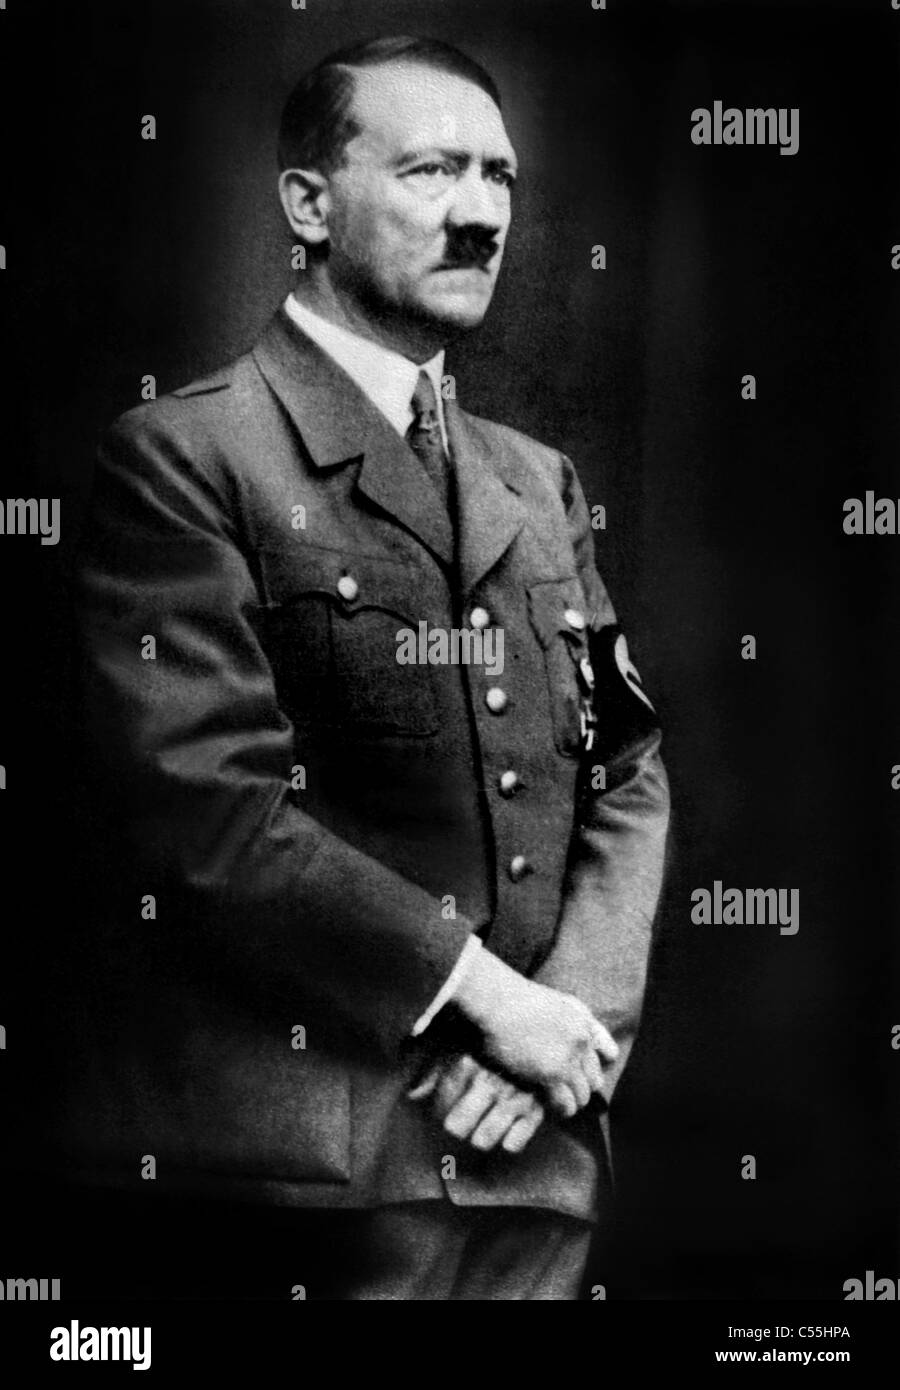 ADOLF HITLER FUHRER OF GERMANY NAZI LEADER 01 May 1940 - Stock Image